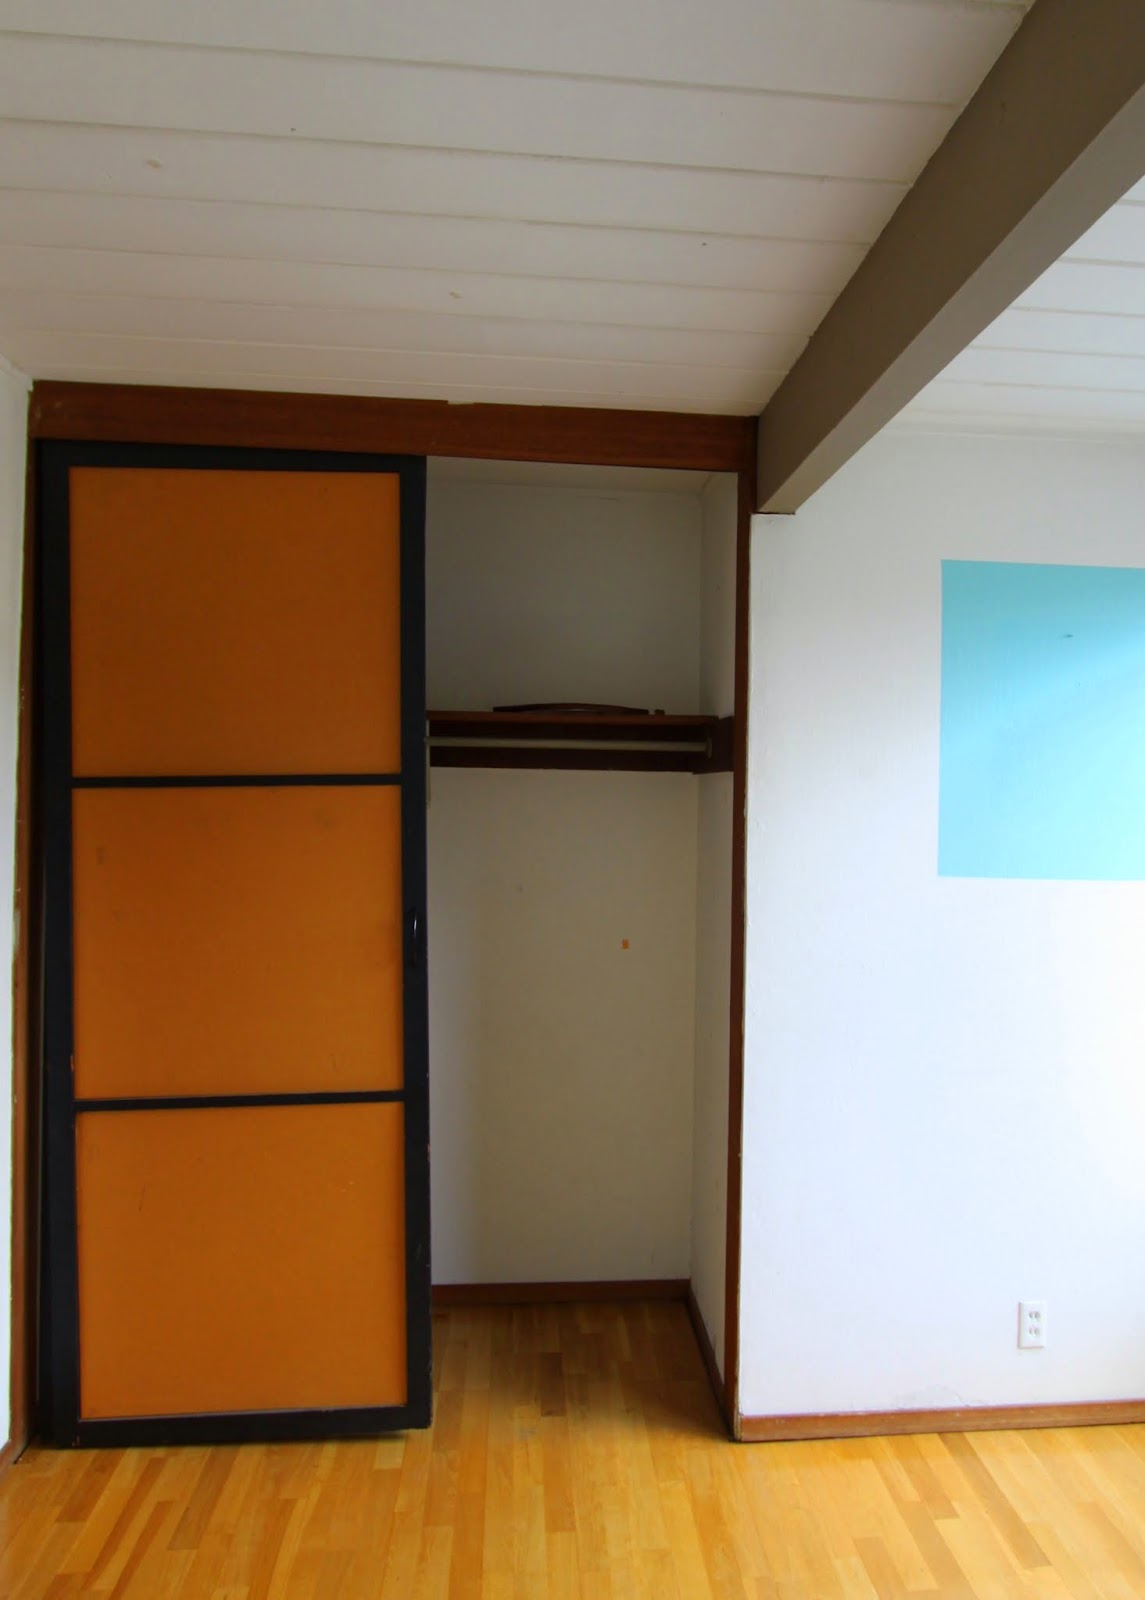 Slatted Room Divider Pristine Eichler On The Market In Fairhaven Orange Tract